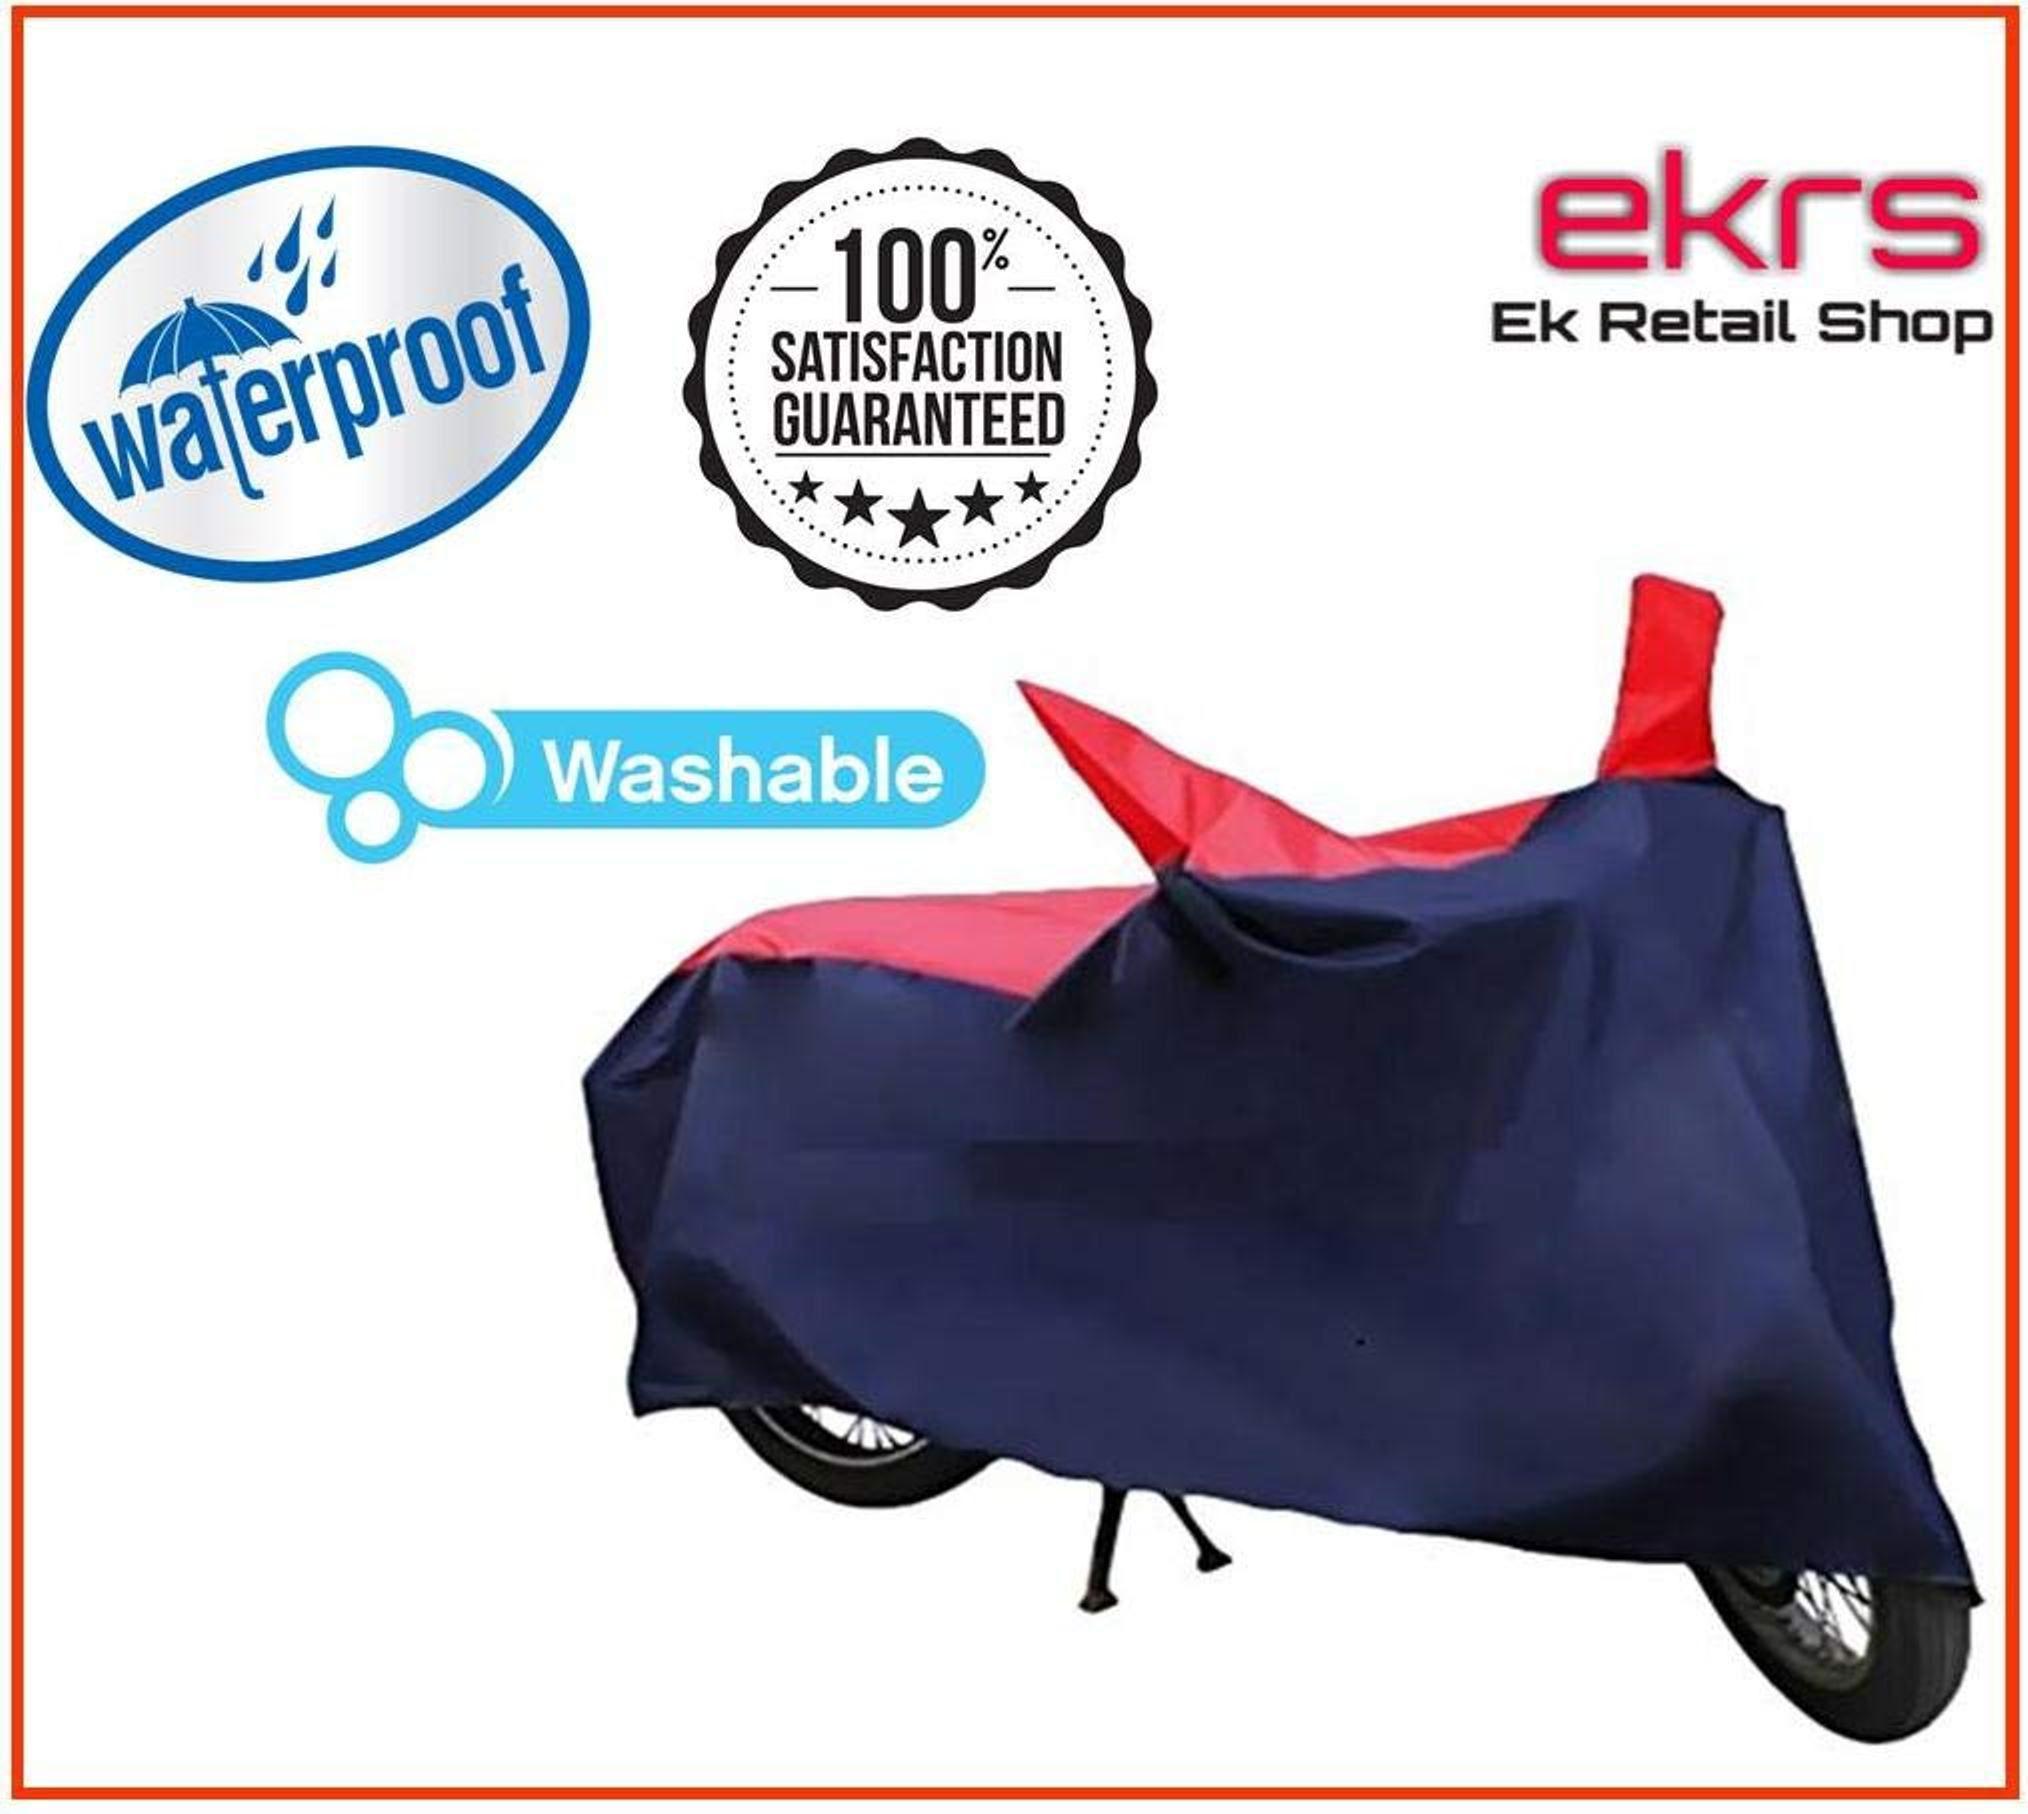 EKRS Nevy/Red Matty Waterproof Bike Body Cover for Honda CBR1000RR Fireblade